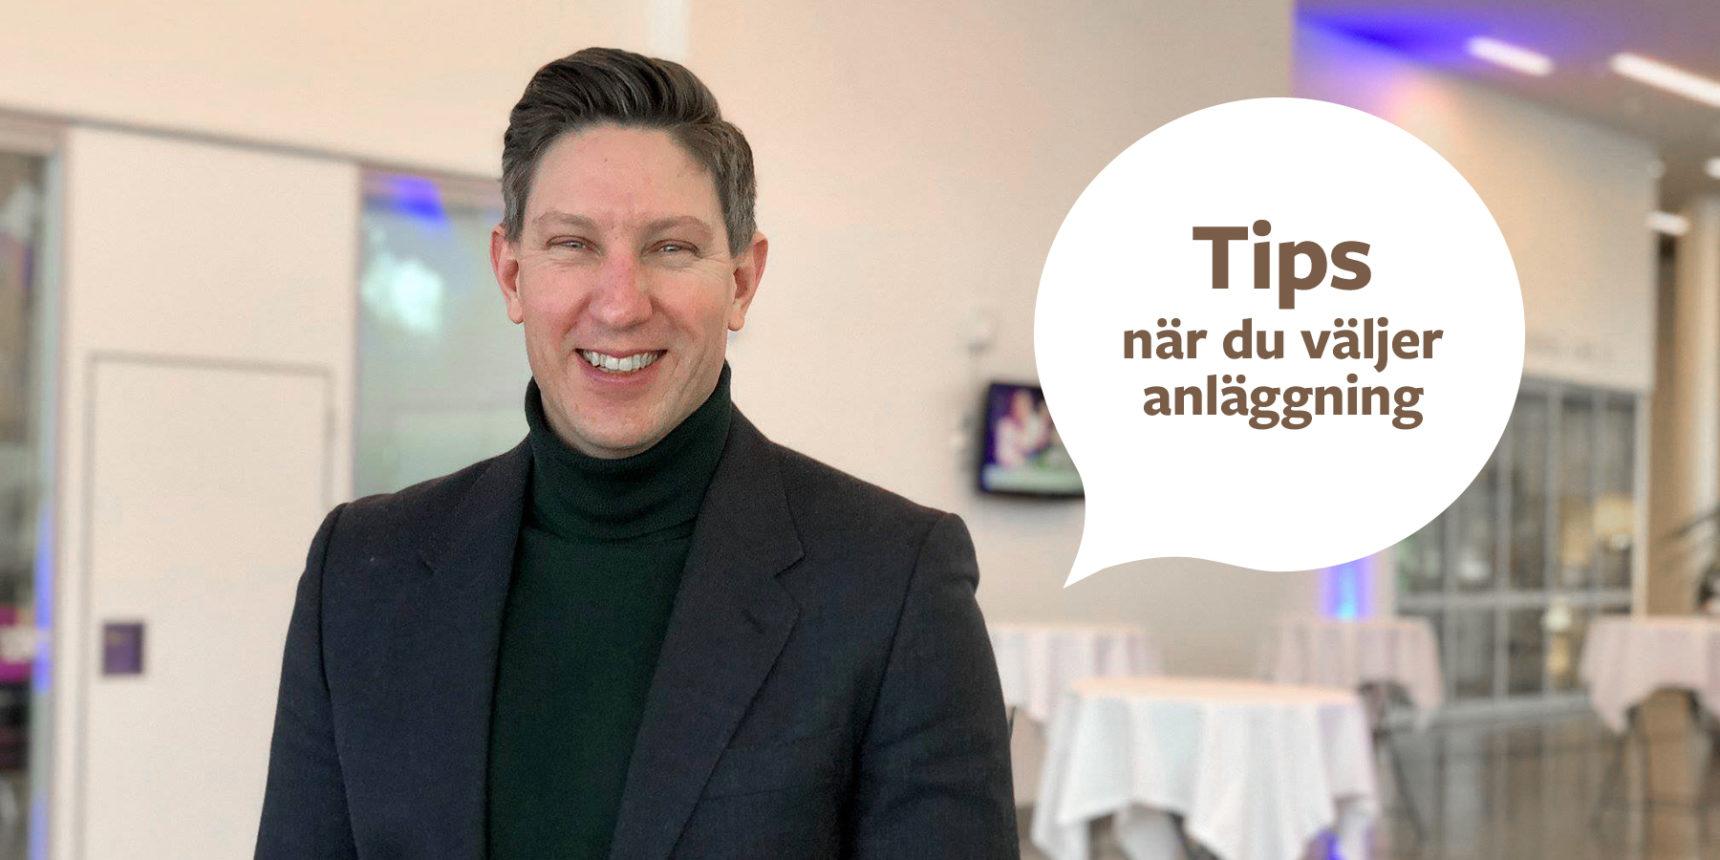 Björn Johannesson